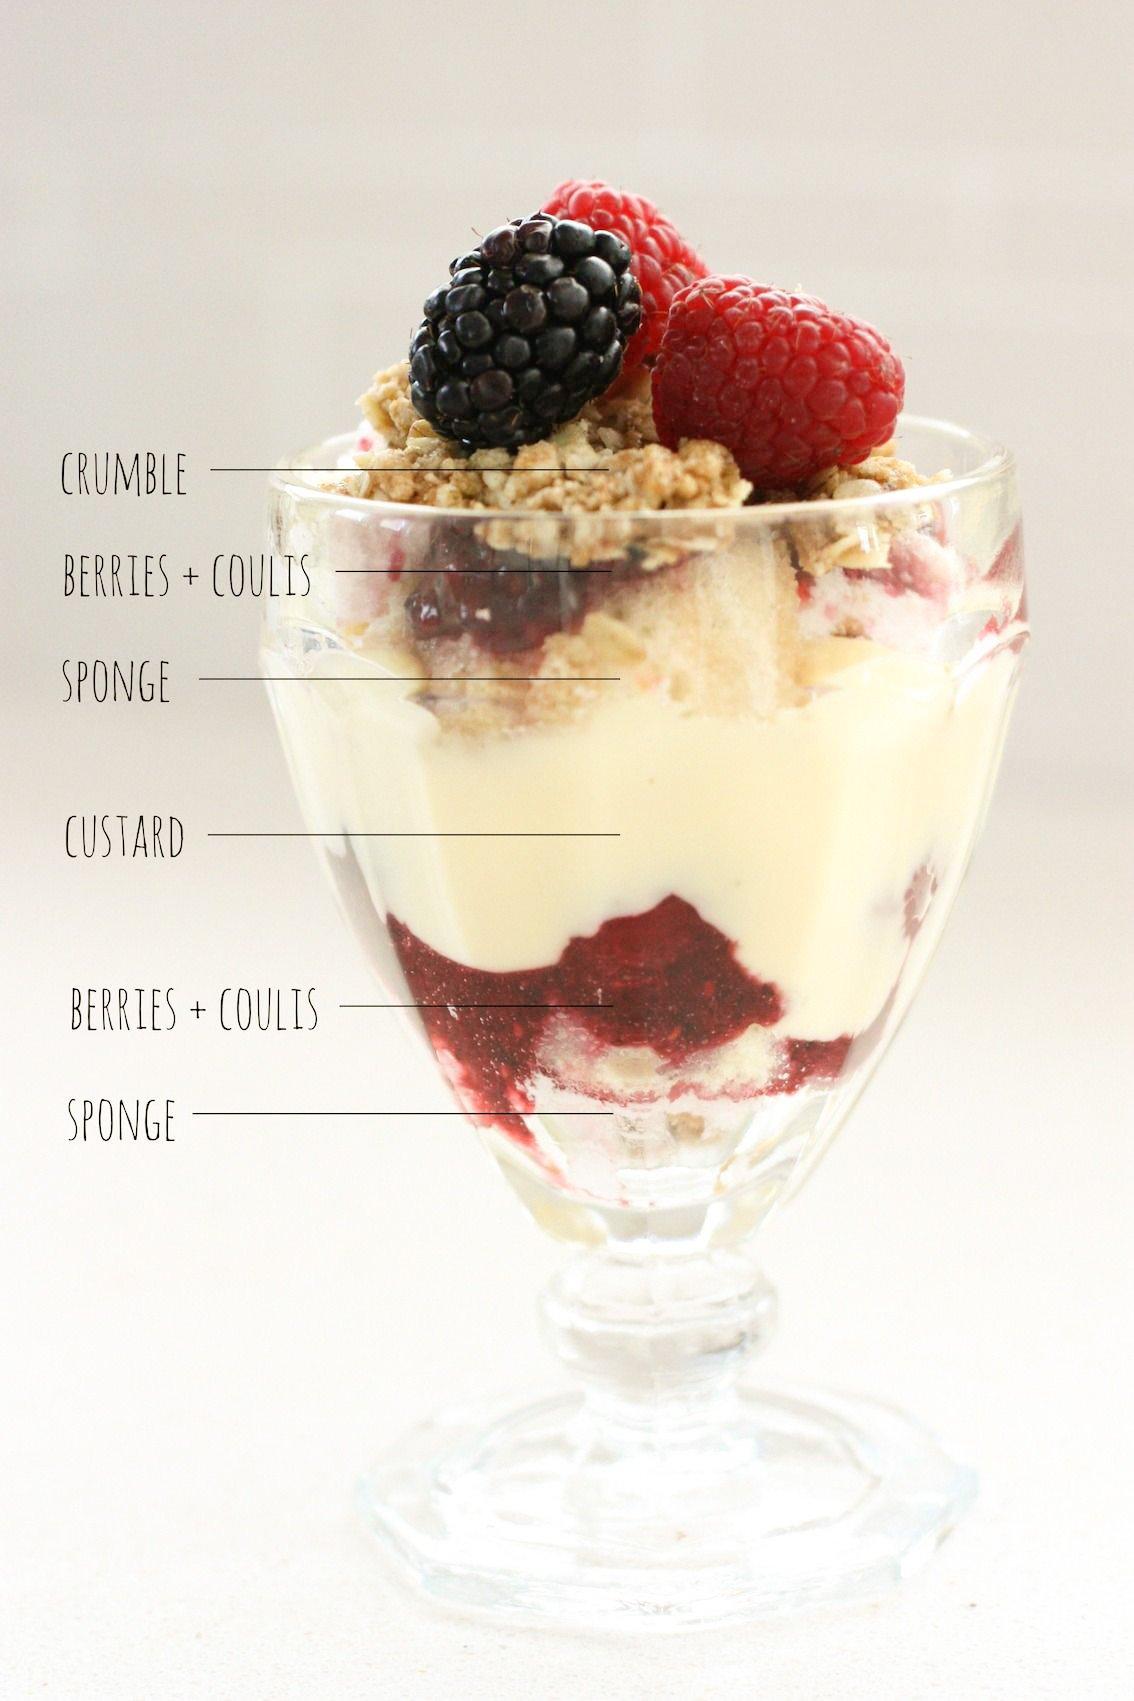 The anatomy of Indivdual Boozy Trifles